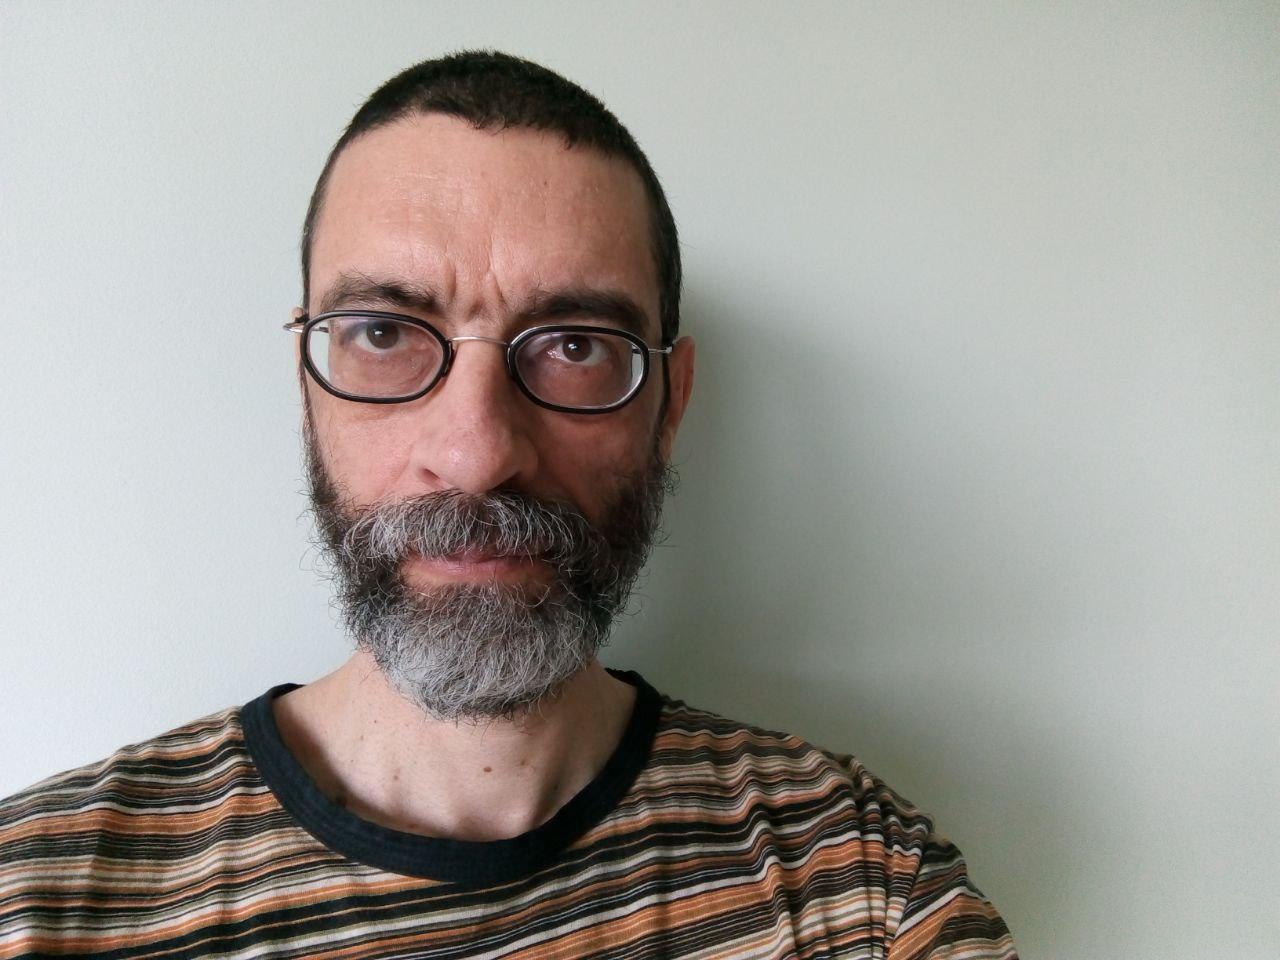 Виктор Корб в Вильнюсе в мае 2019 года